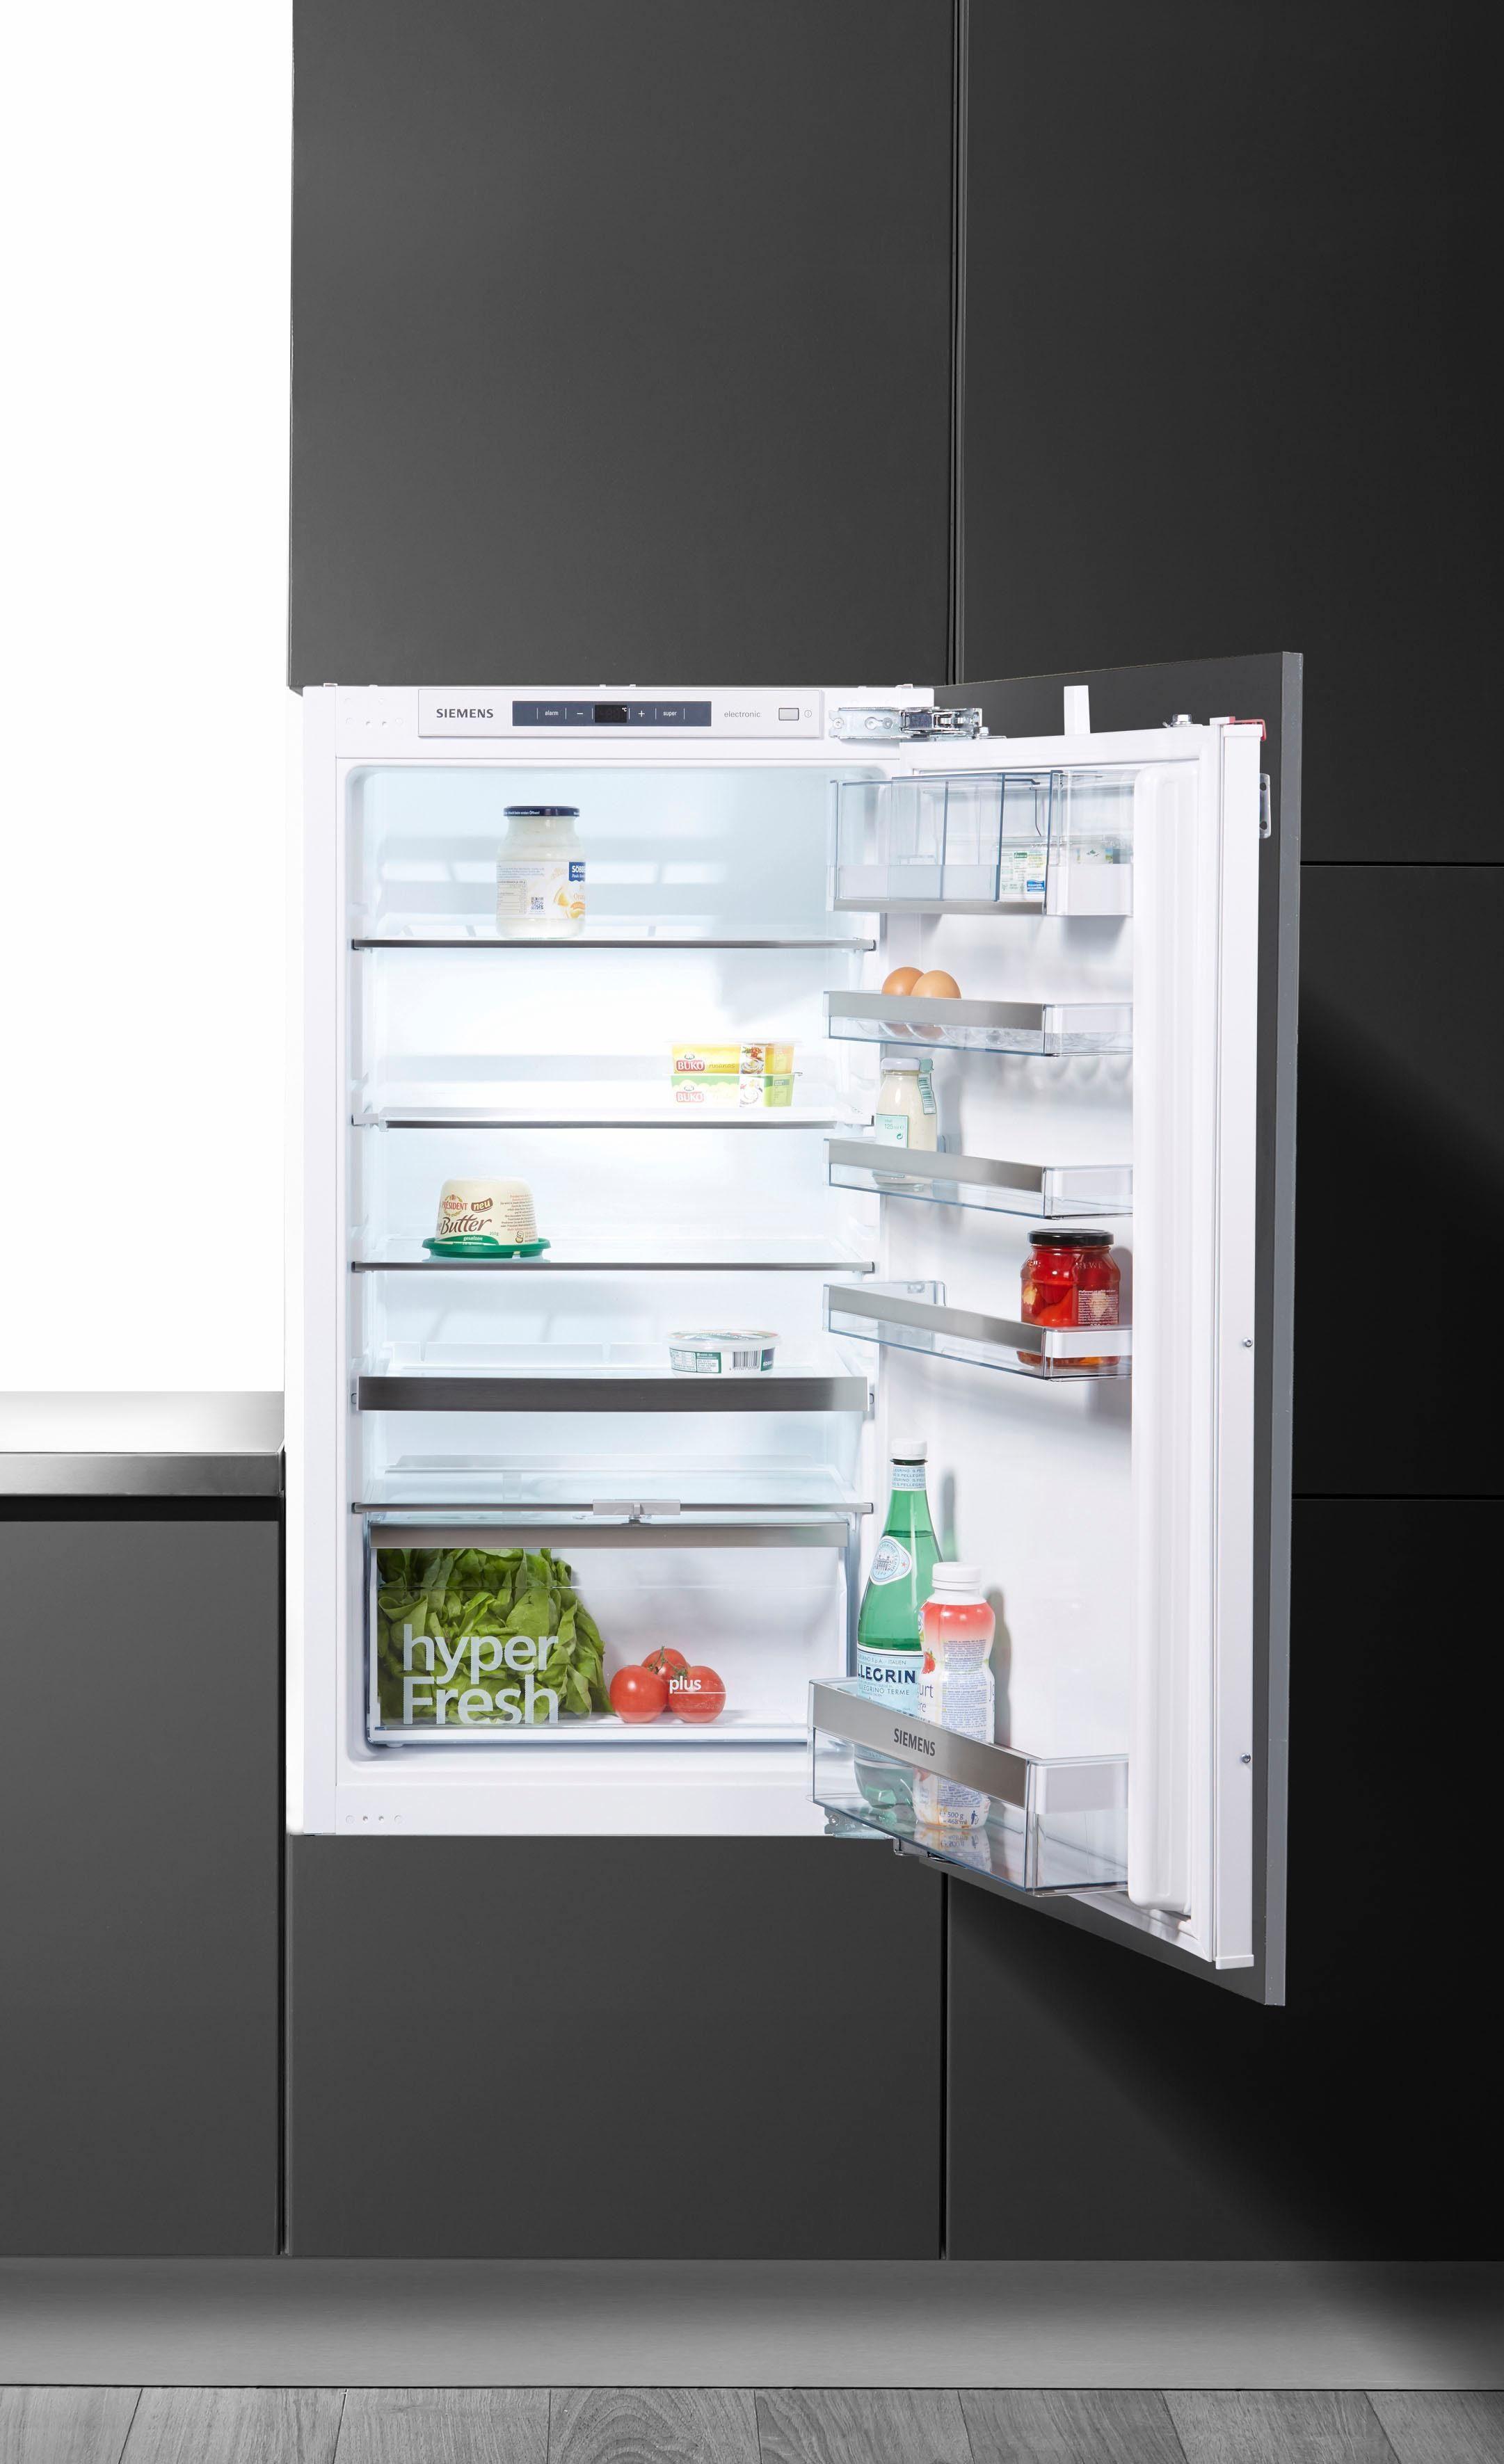 Siemens Einbau-Kühlautomat KI31RAD30, Energieklasse A++, 102,1 cm hoch